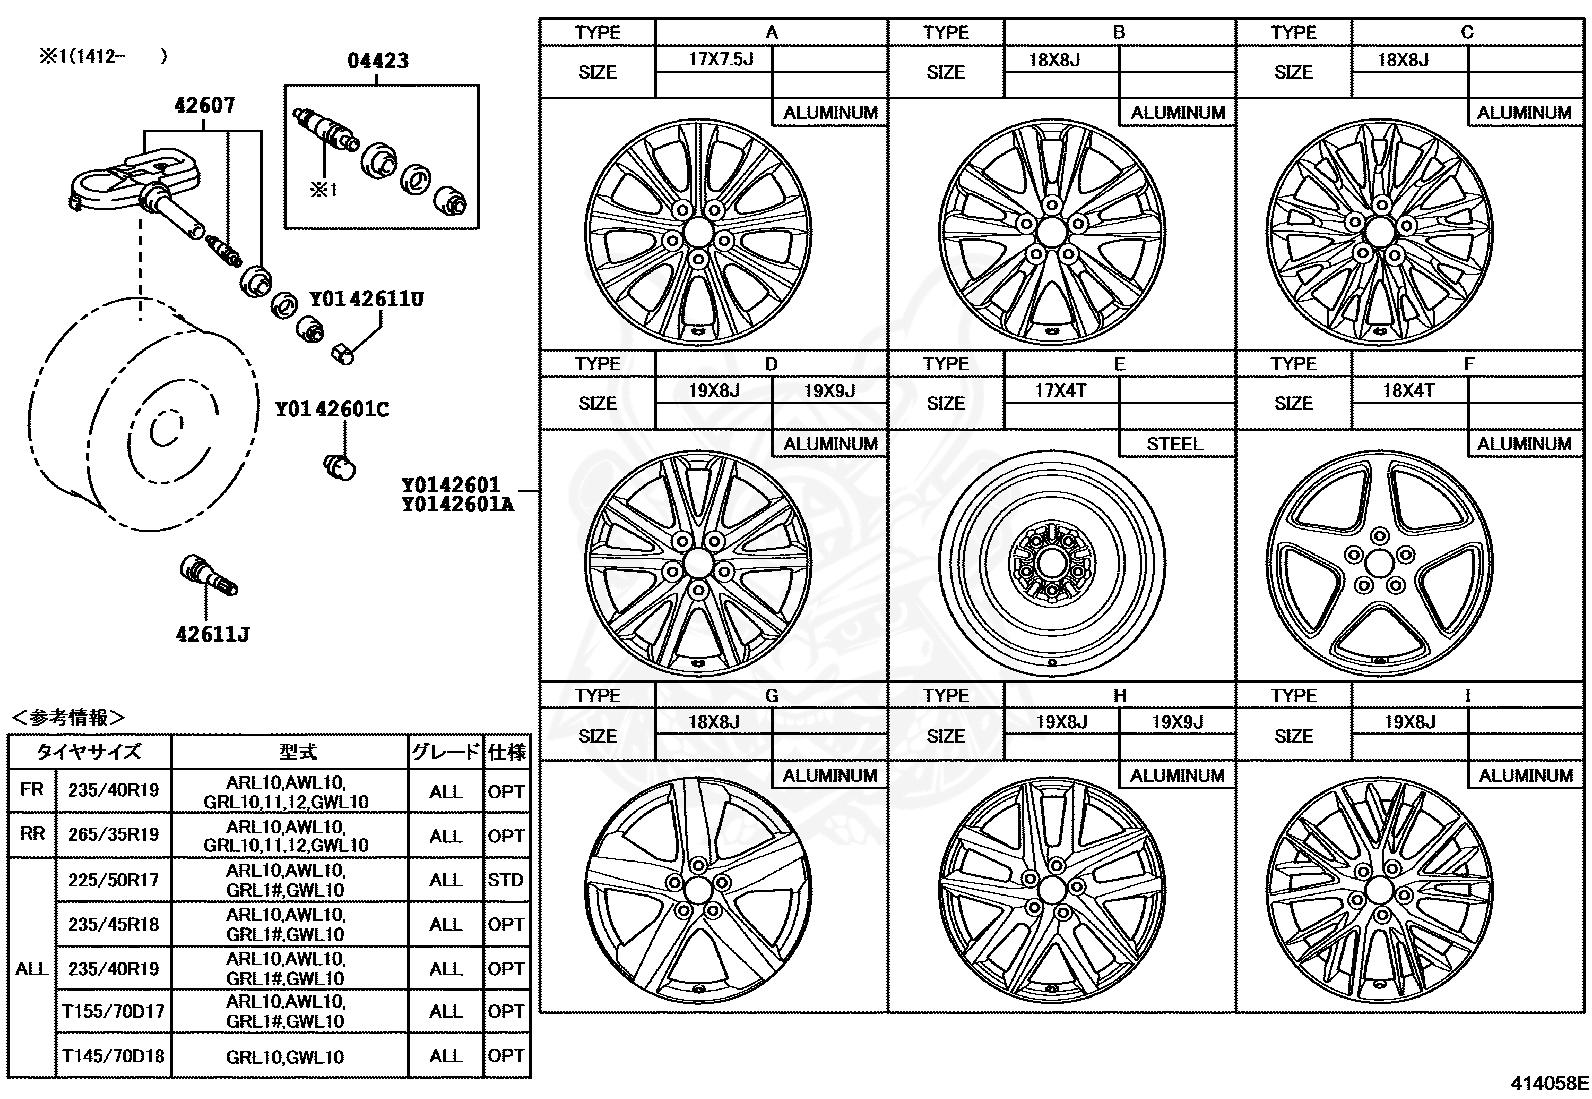 Lexus - Fitting Kit, Tire Pressure Monitor Or Balancer Valve